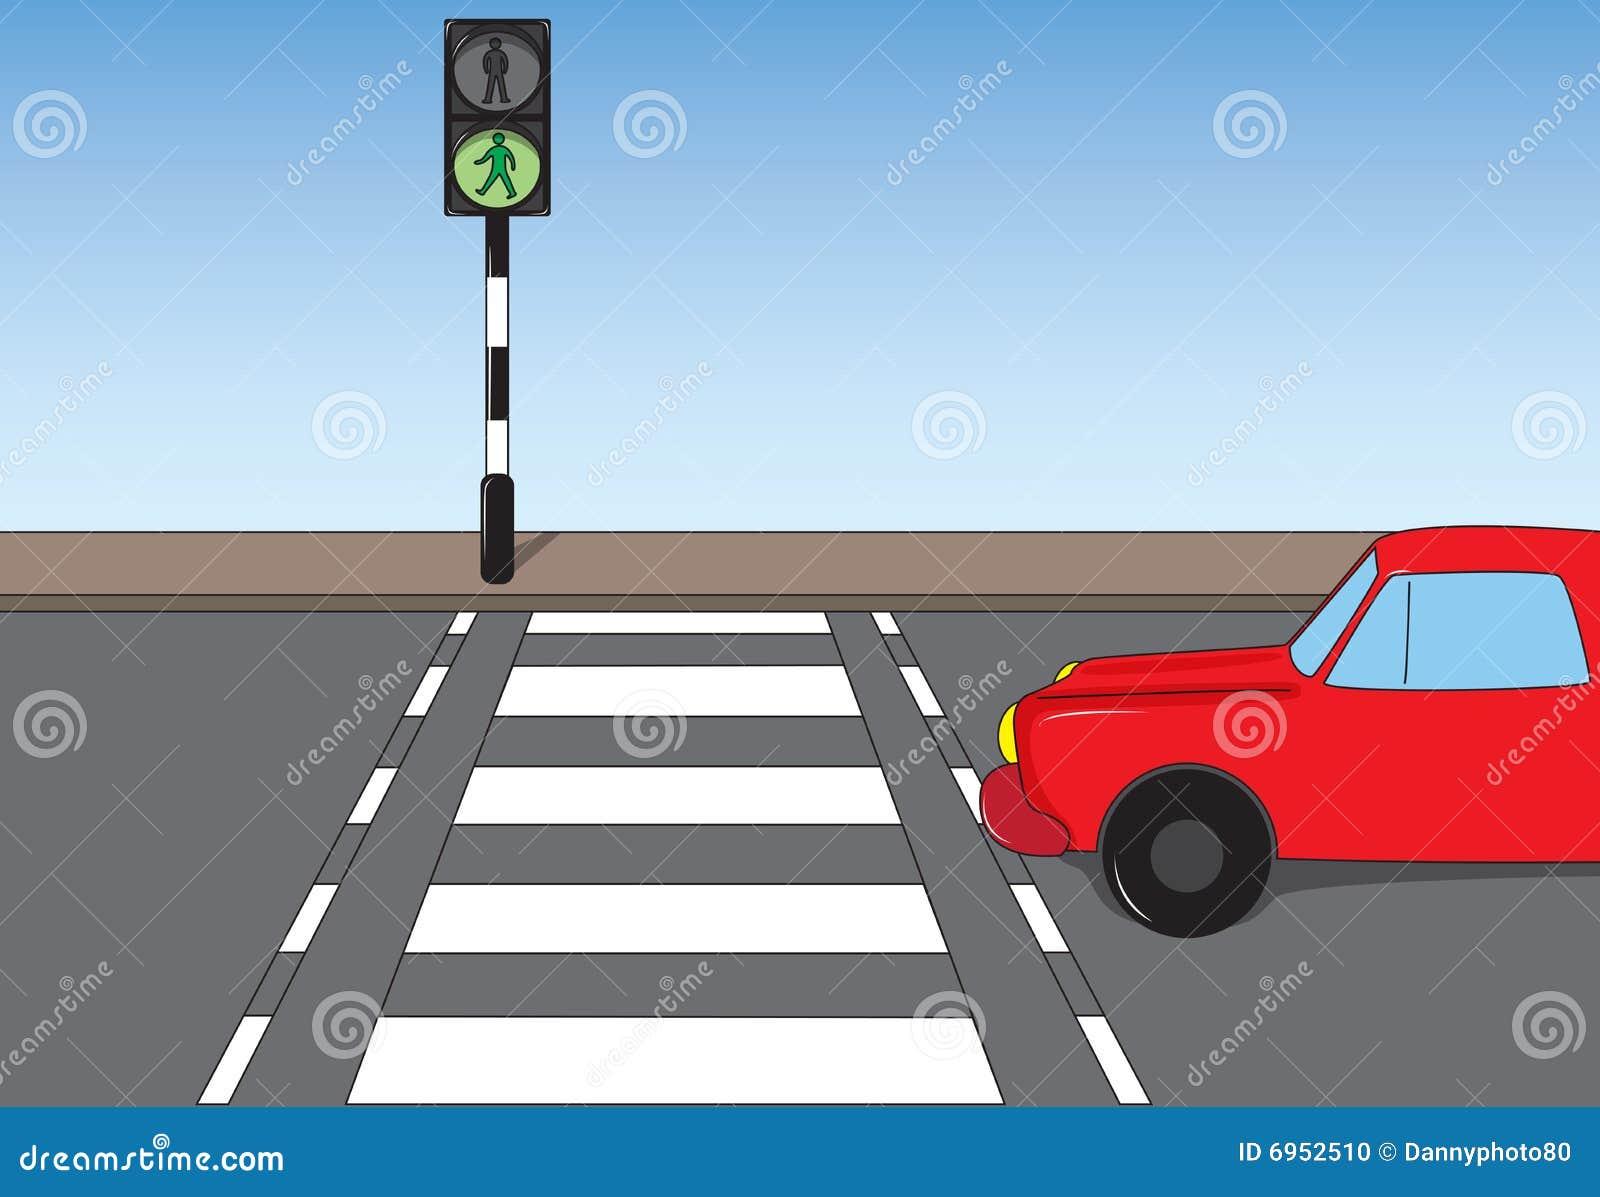 Line Drawing Of Zebra Crossing : Traffic scene stock photo image